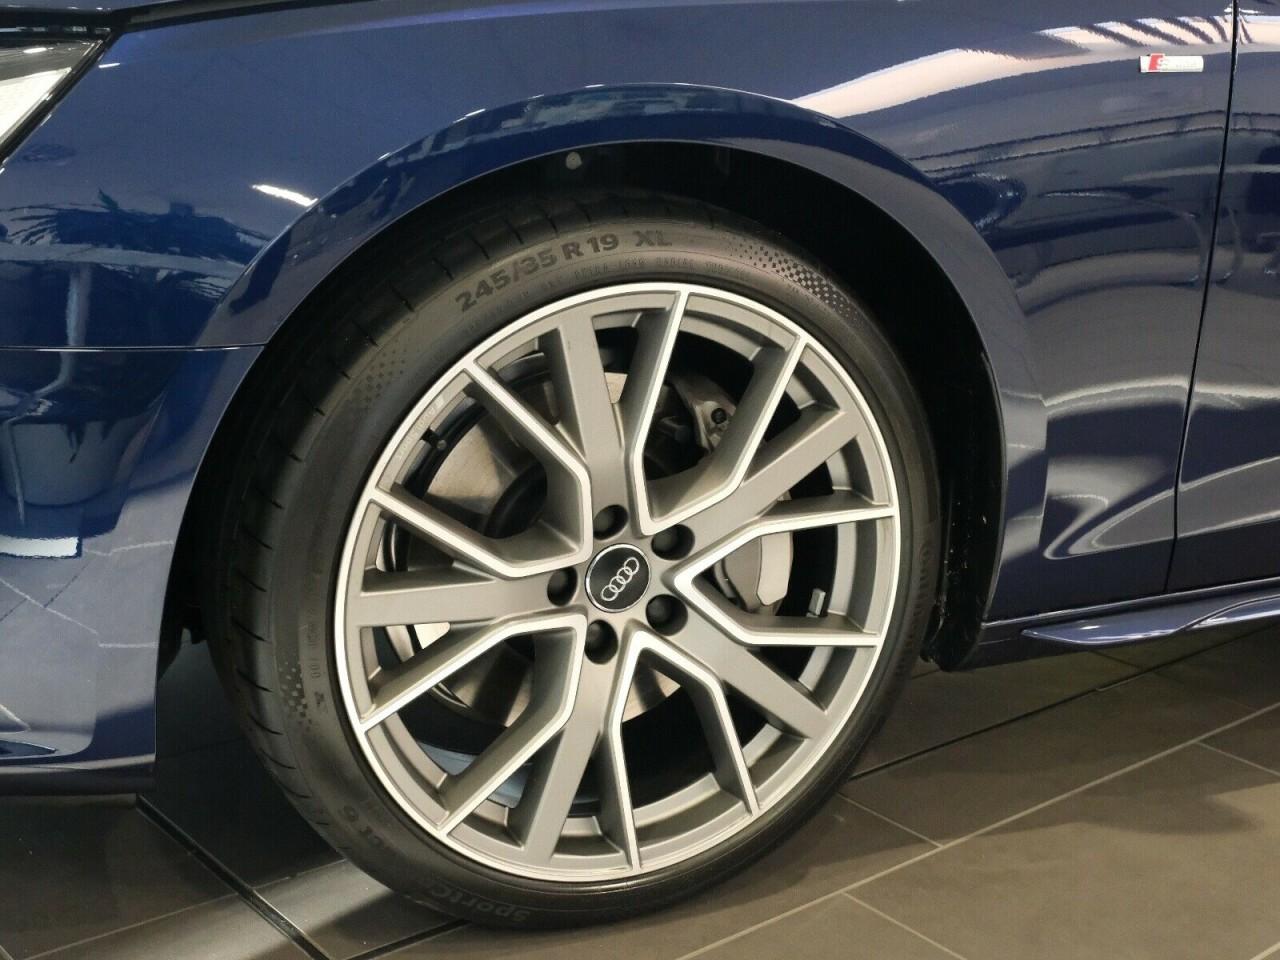 Audi A4 AVANT 45 TFSI Q.S TRONIC S LINE